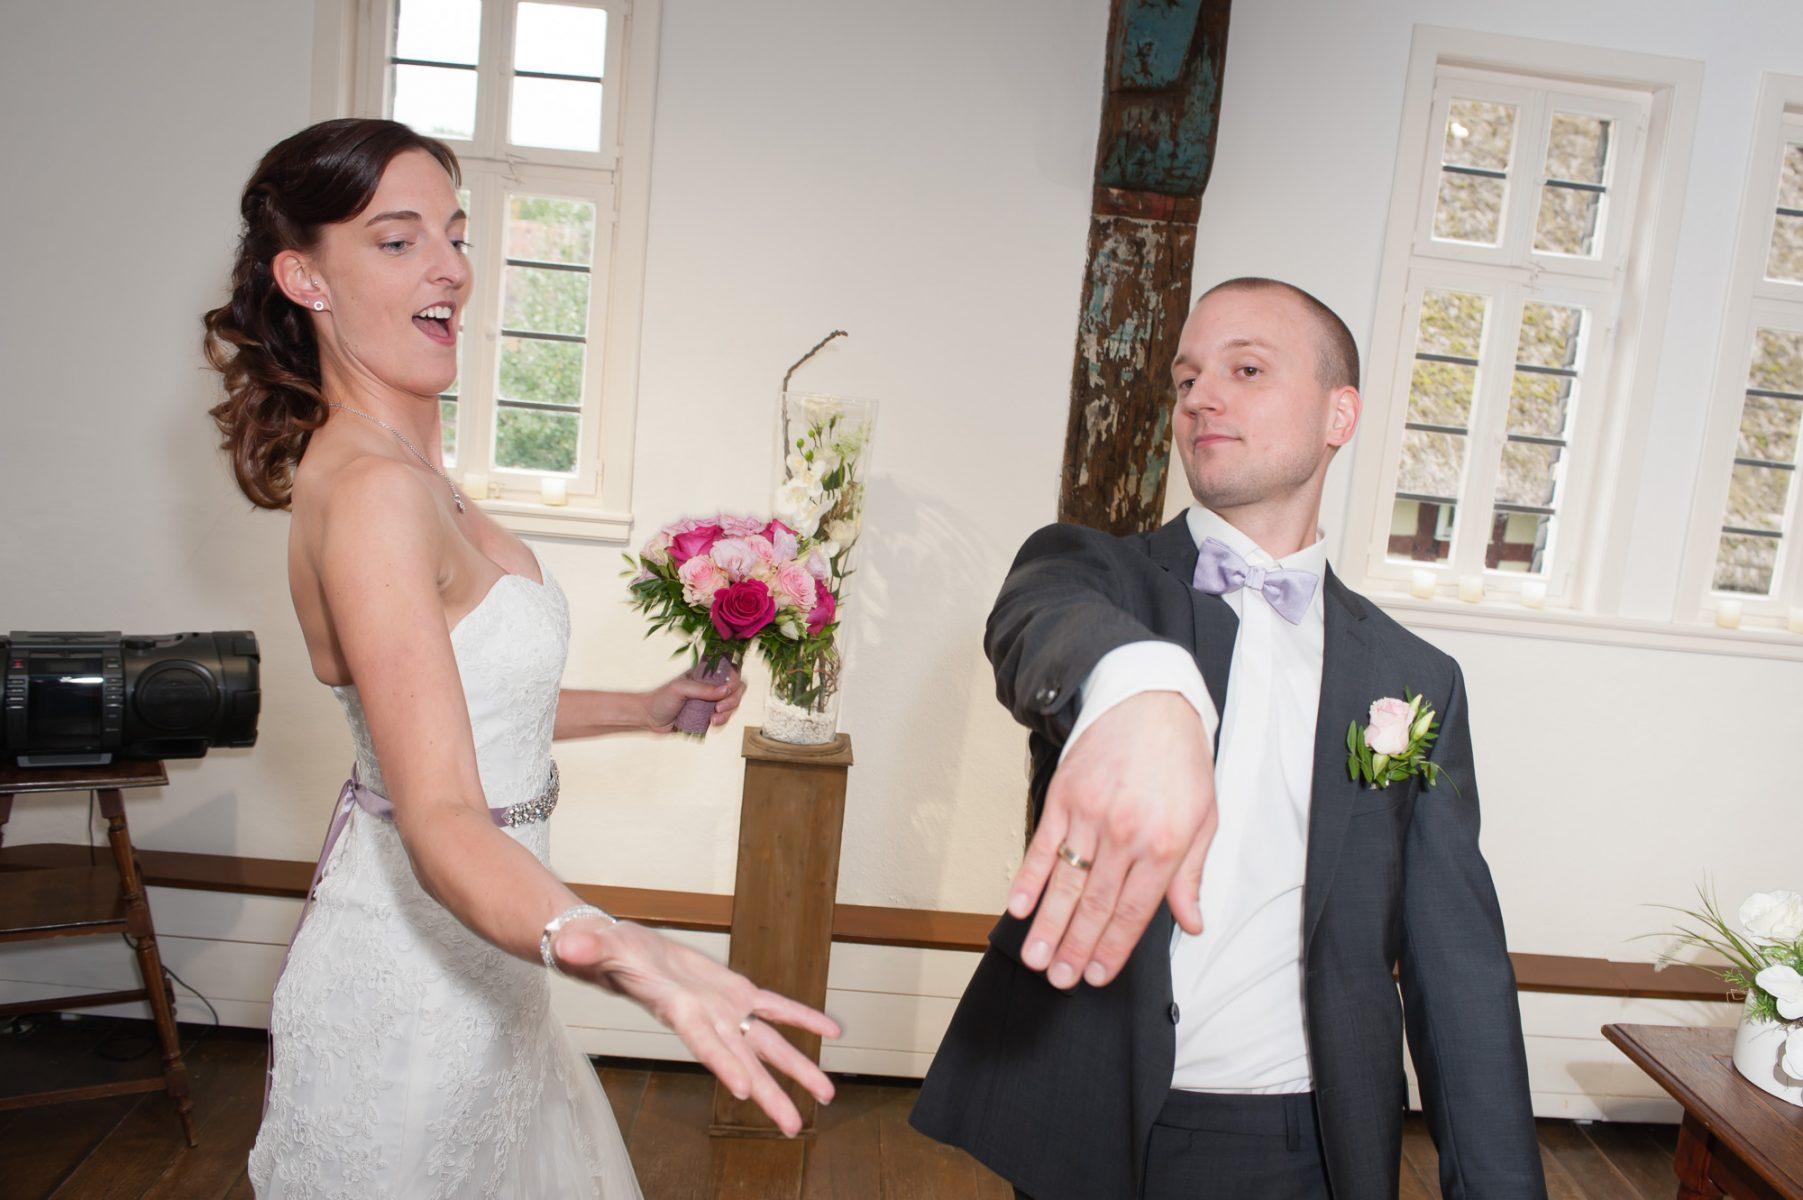 Hochzeit NadineKai 10 2017 B2000 226885 1803x1200 - Trauung